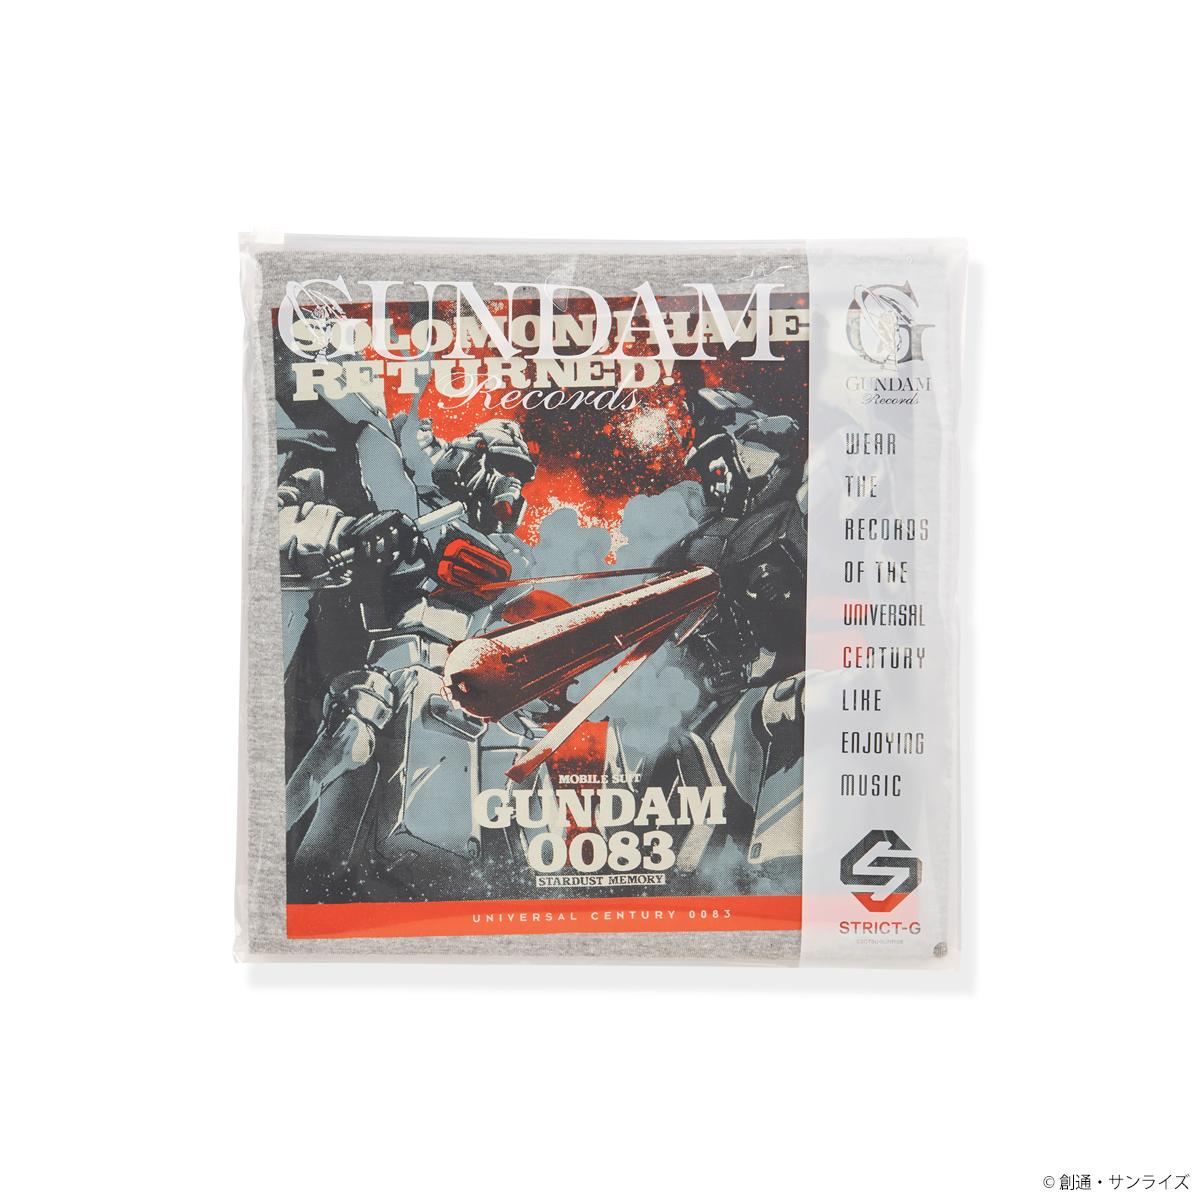 STRICT-G GUNDAM RECORDS 『機動戦士ガンダム 0083 STARDUST MEMORY』Tシャツ